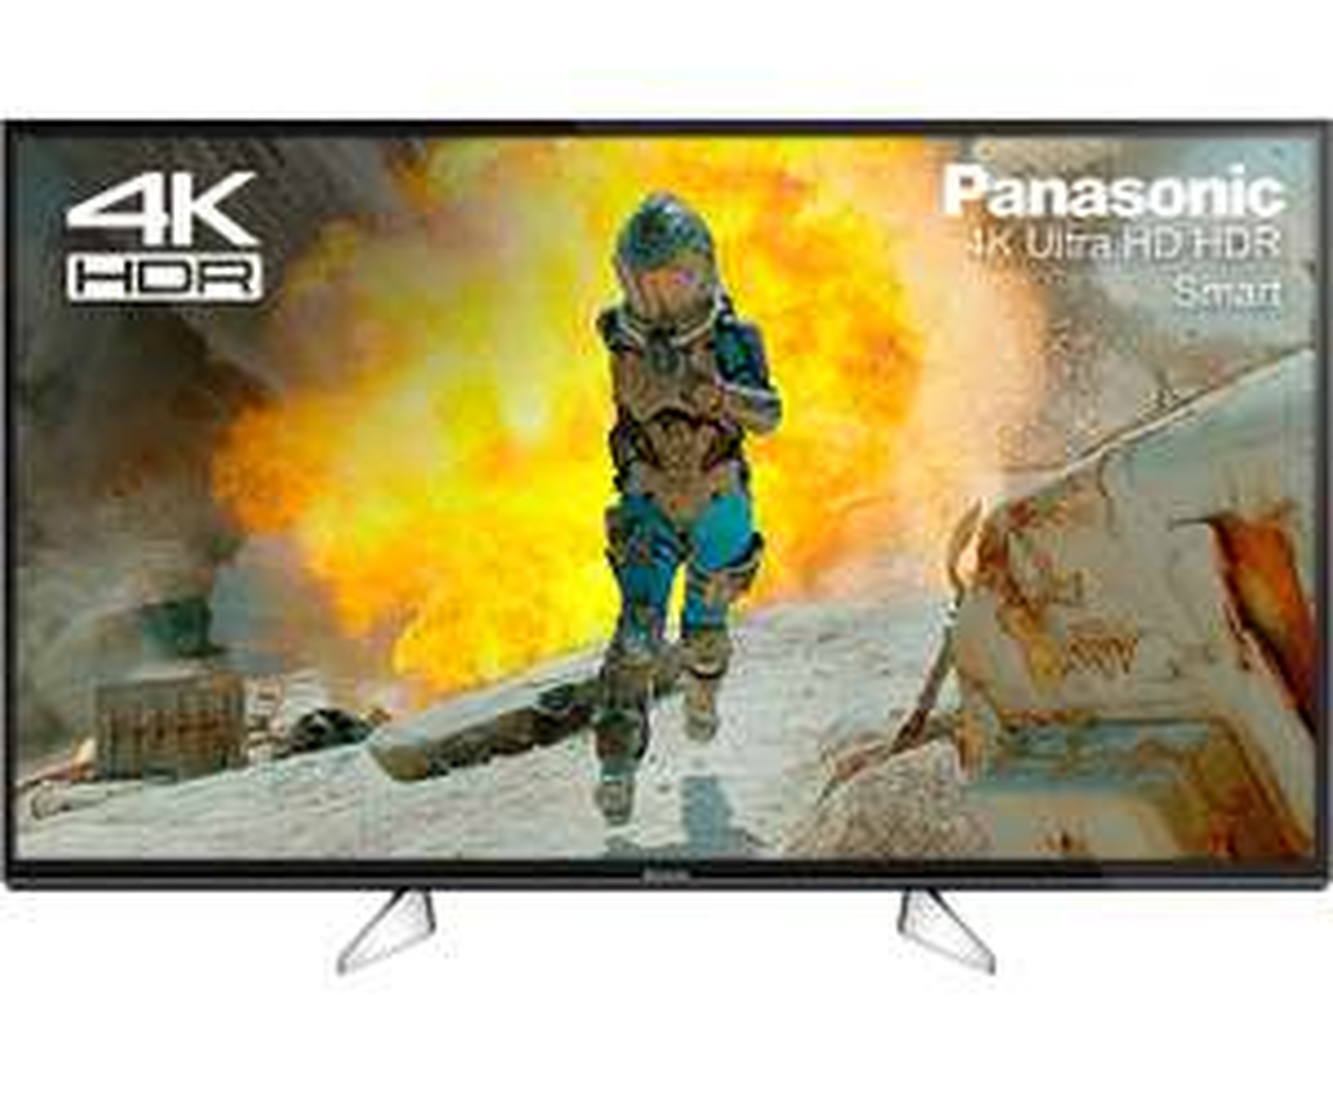 Panasonic TX-65EXW604 4K Ultra HD TV - 65 inch na cashback @ AO.nl